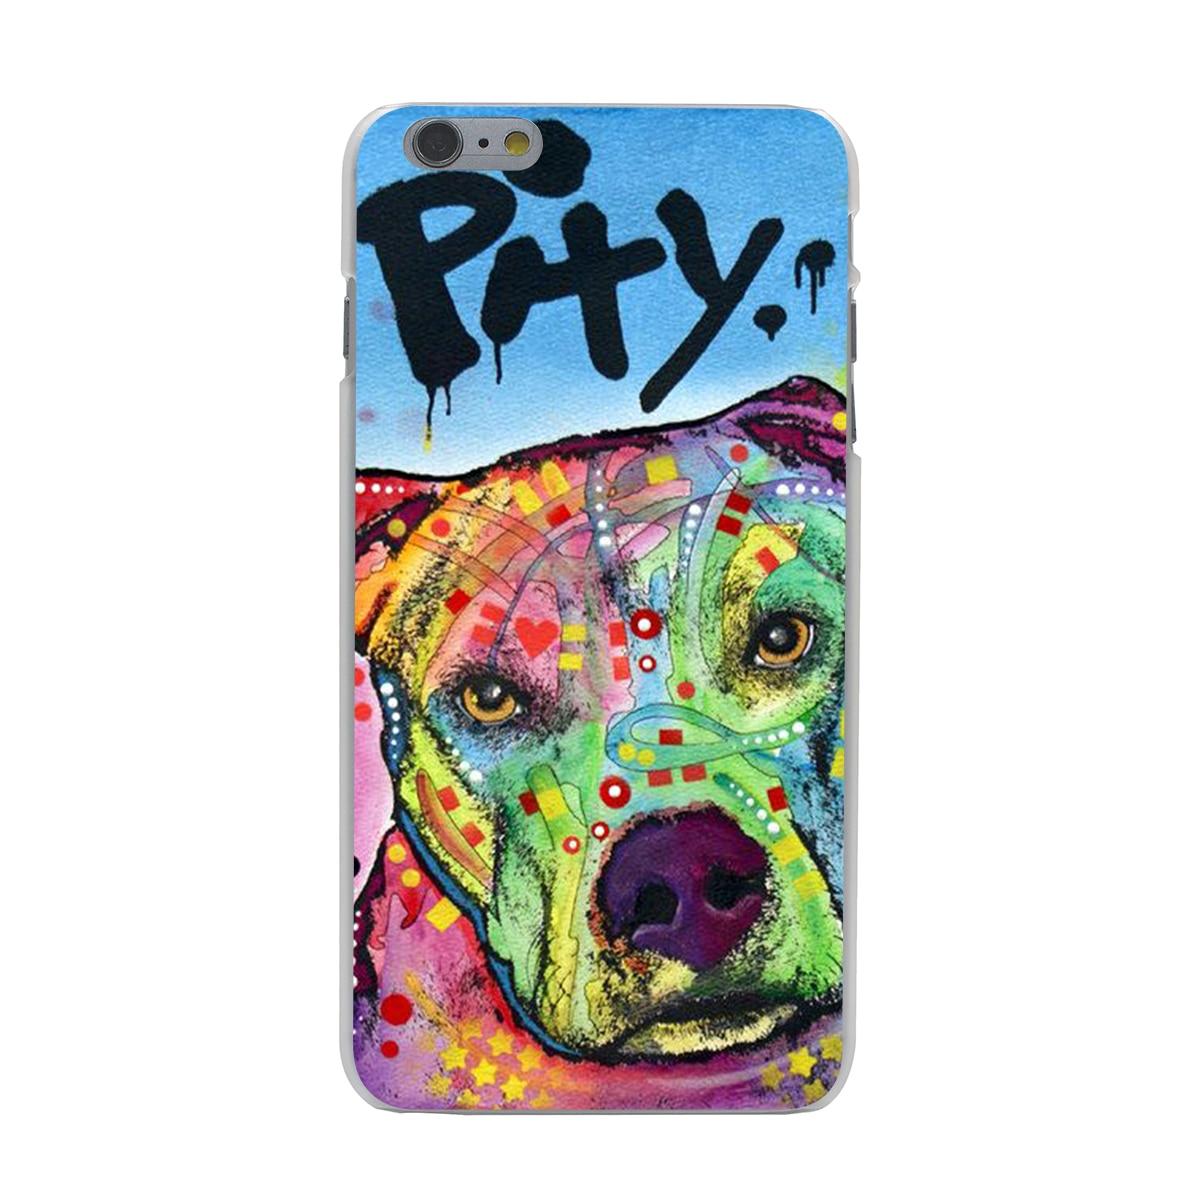 Pitbull Iphone case 6